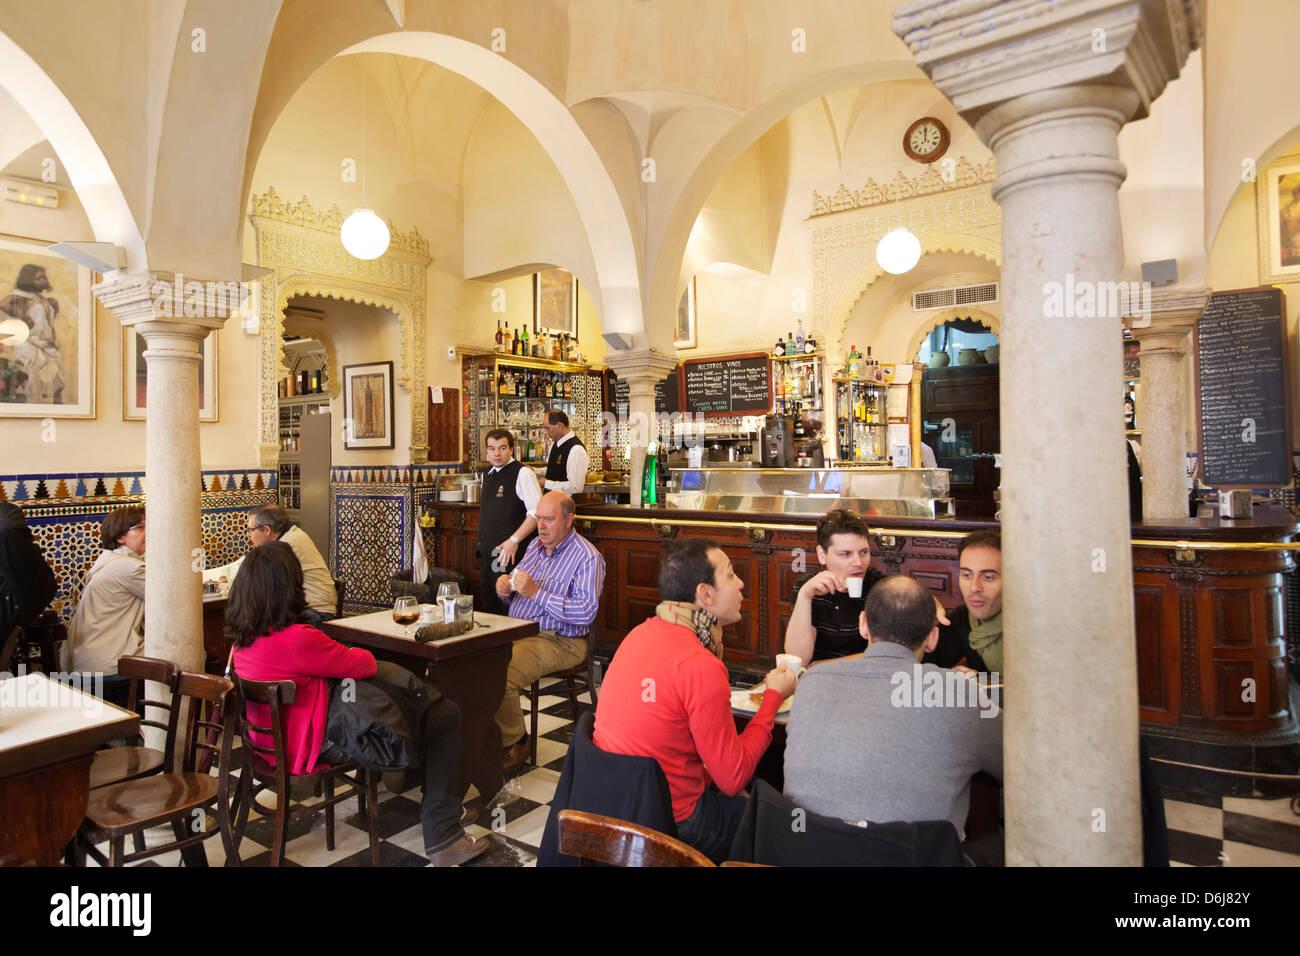 Bar Giralda (Calle Mateos Gago 1) set in Moorish bathouse, Seville, Andalucia, Spain, Europe - Stock Image